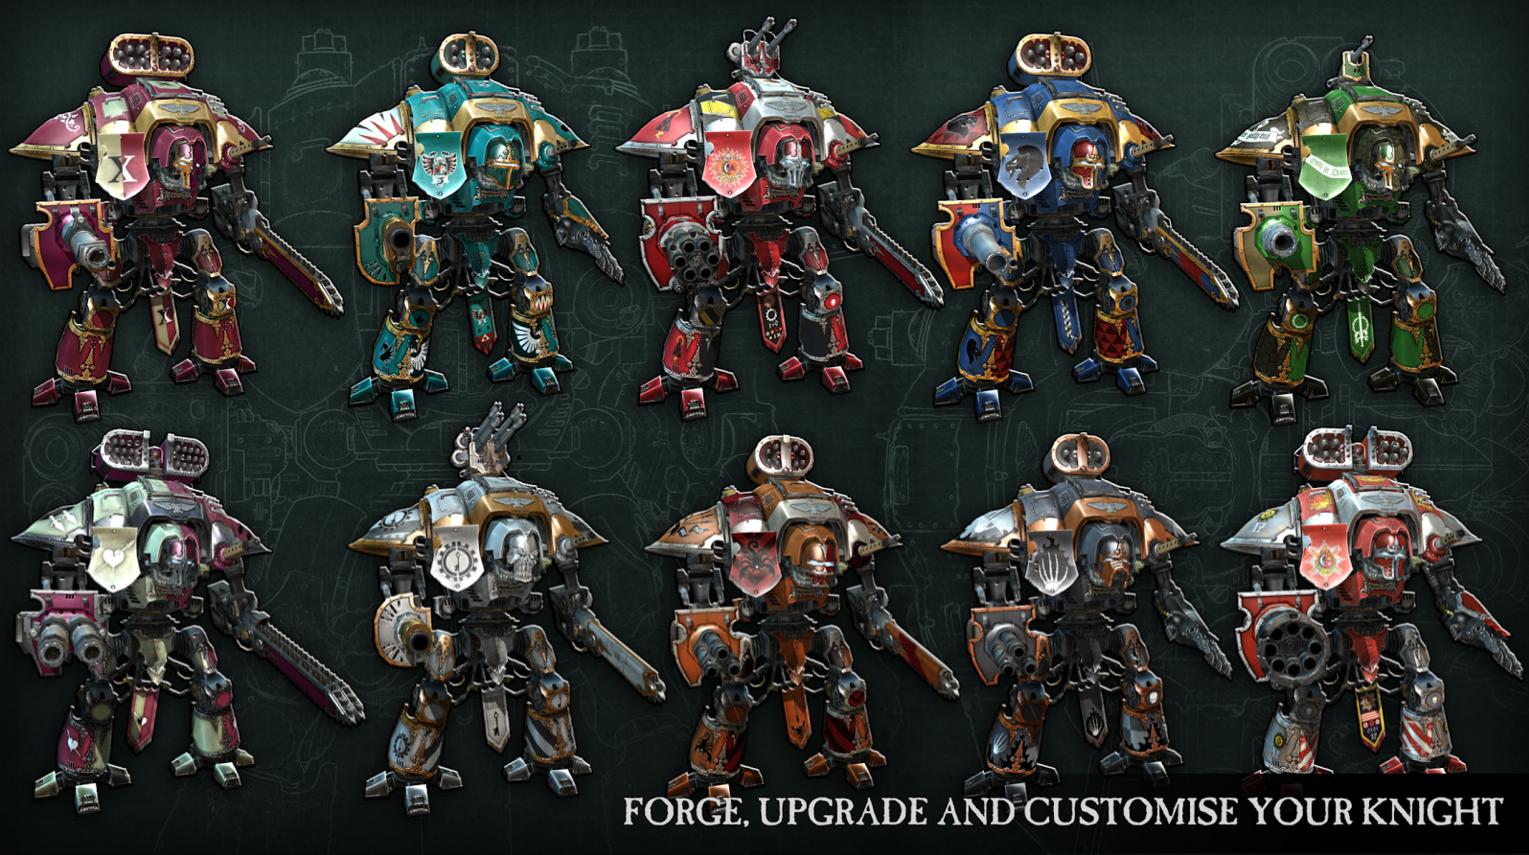 Warhammer_40k_40000_Freeblade_Play_Store_2